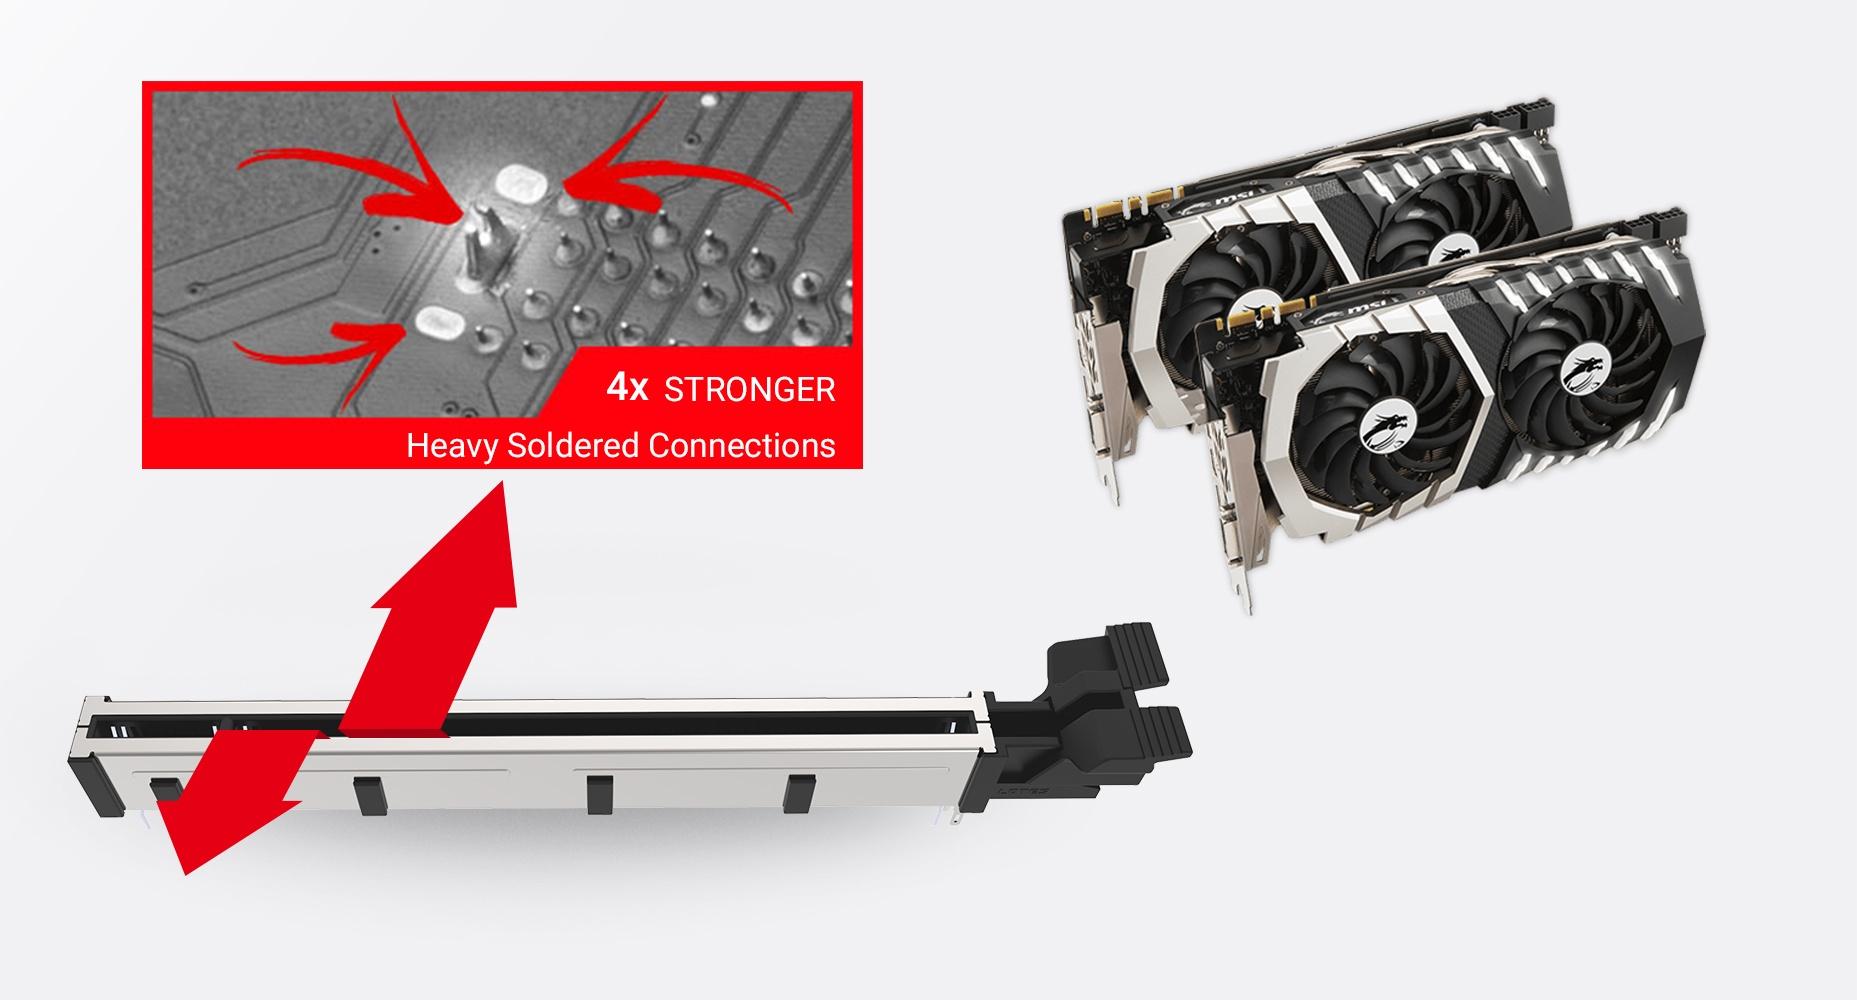 MSI MAG B460M MORTAR WIFI MULTIPLE GPU SUPPORTS AND STEEL ARMOR